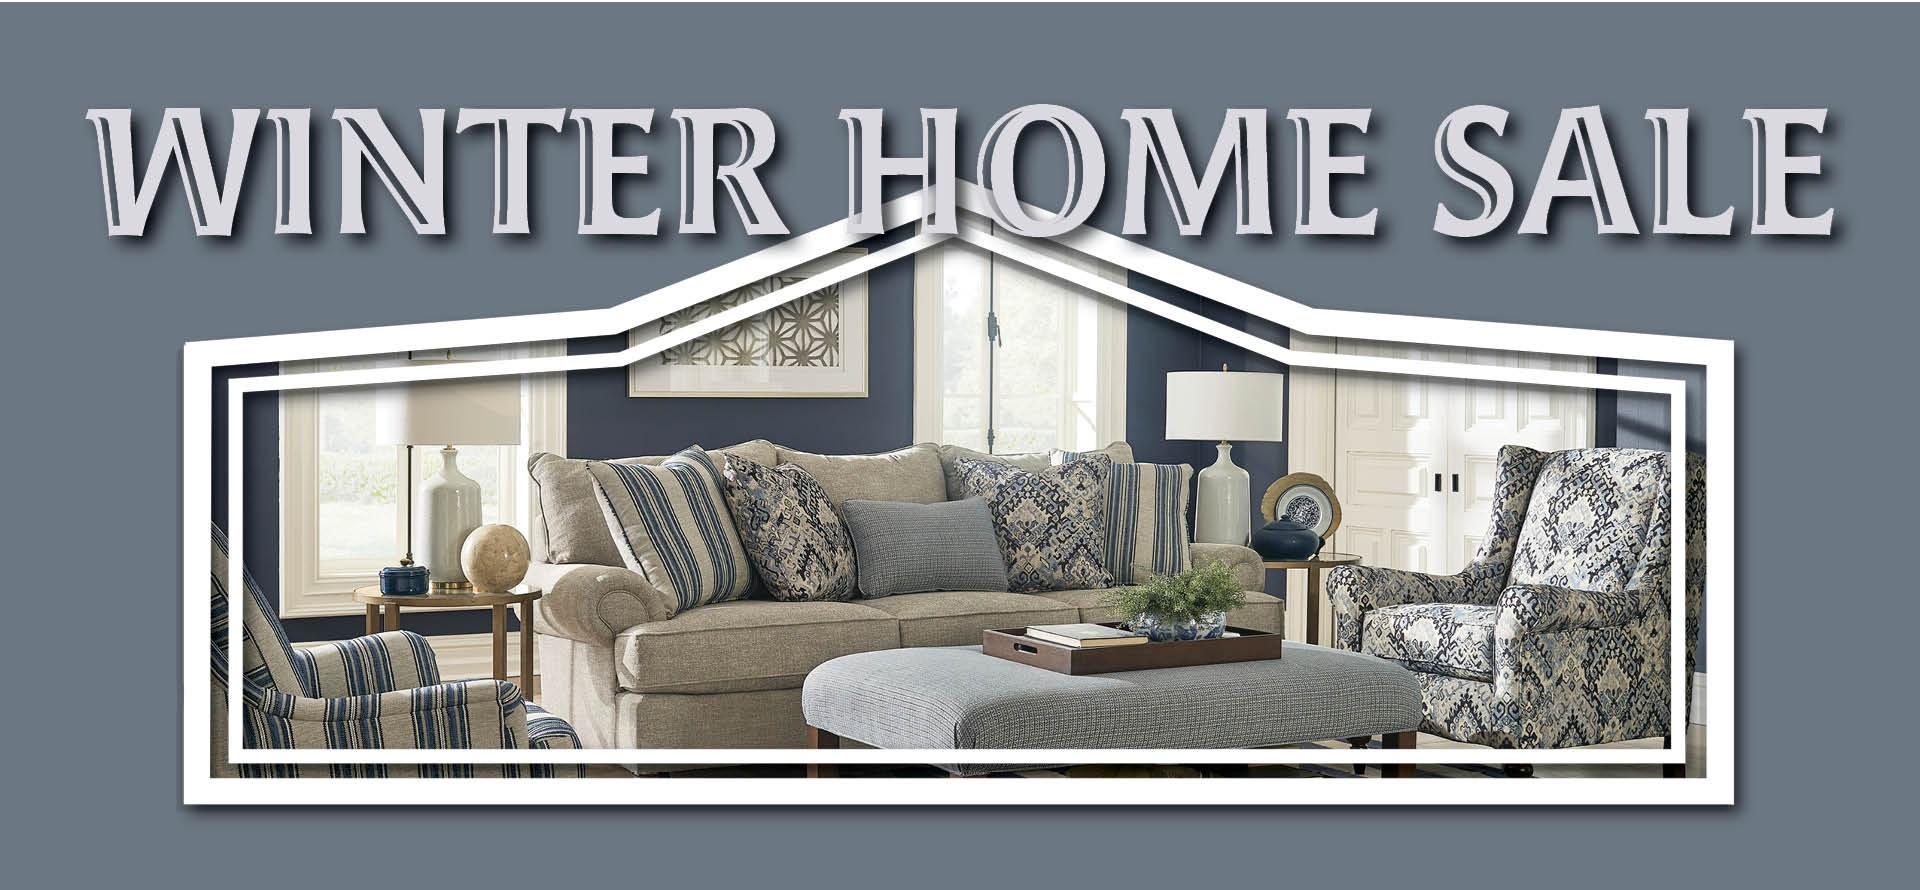 Home Sale 2021